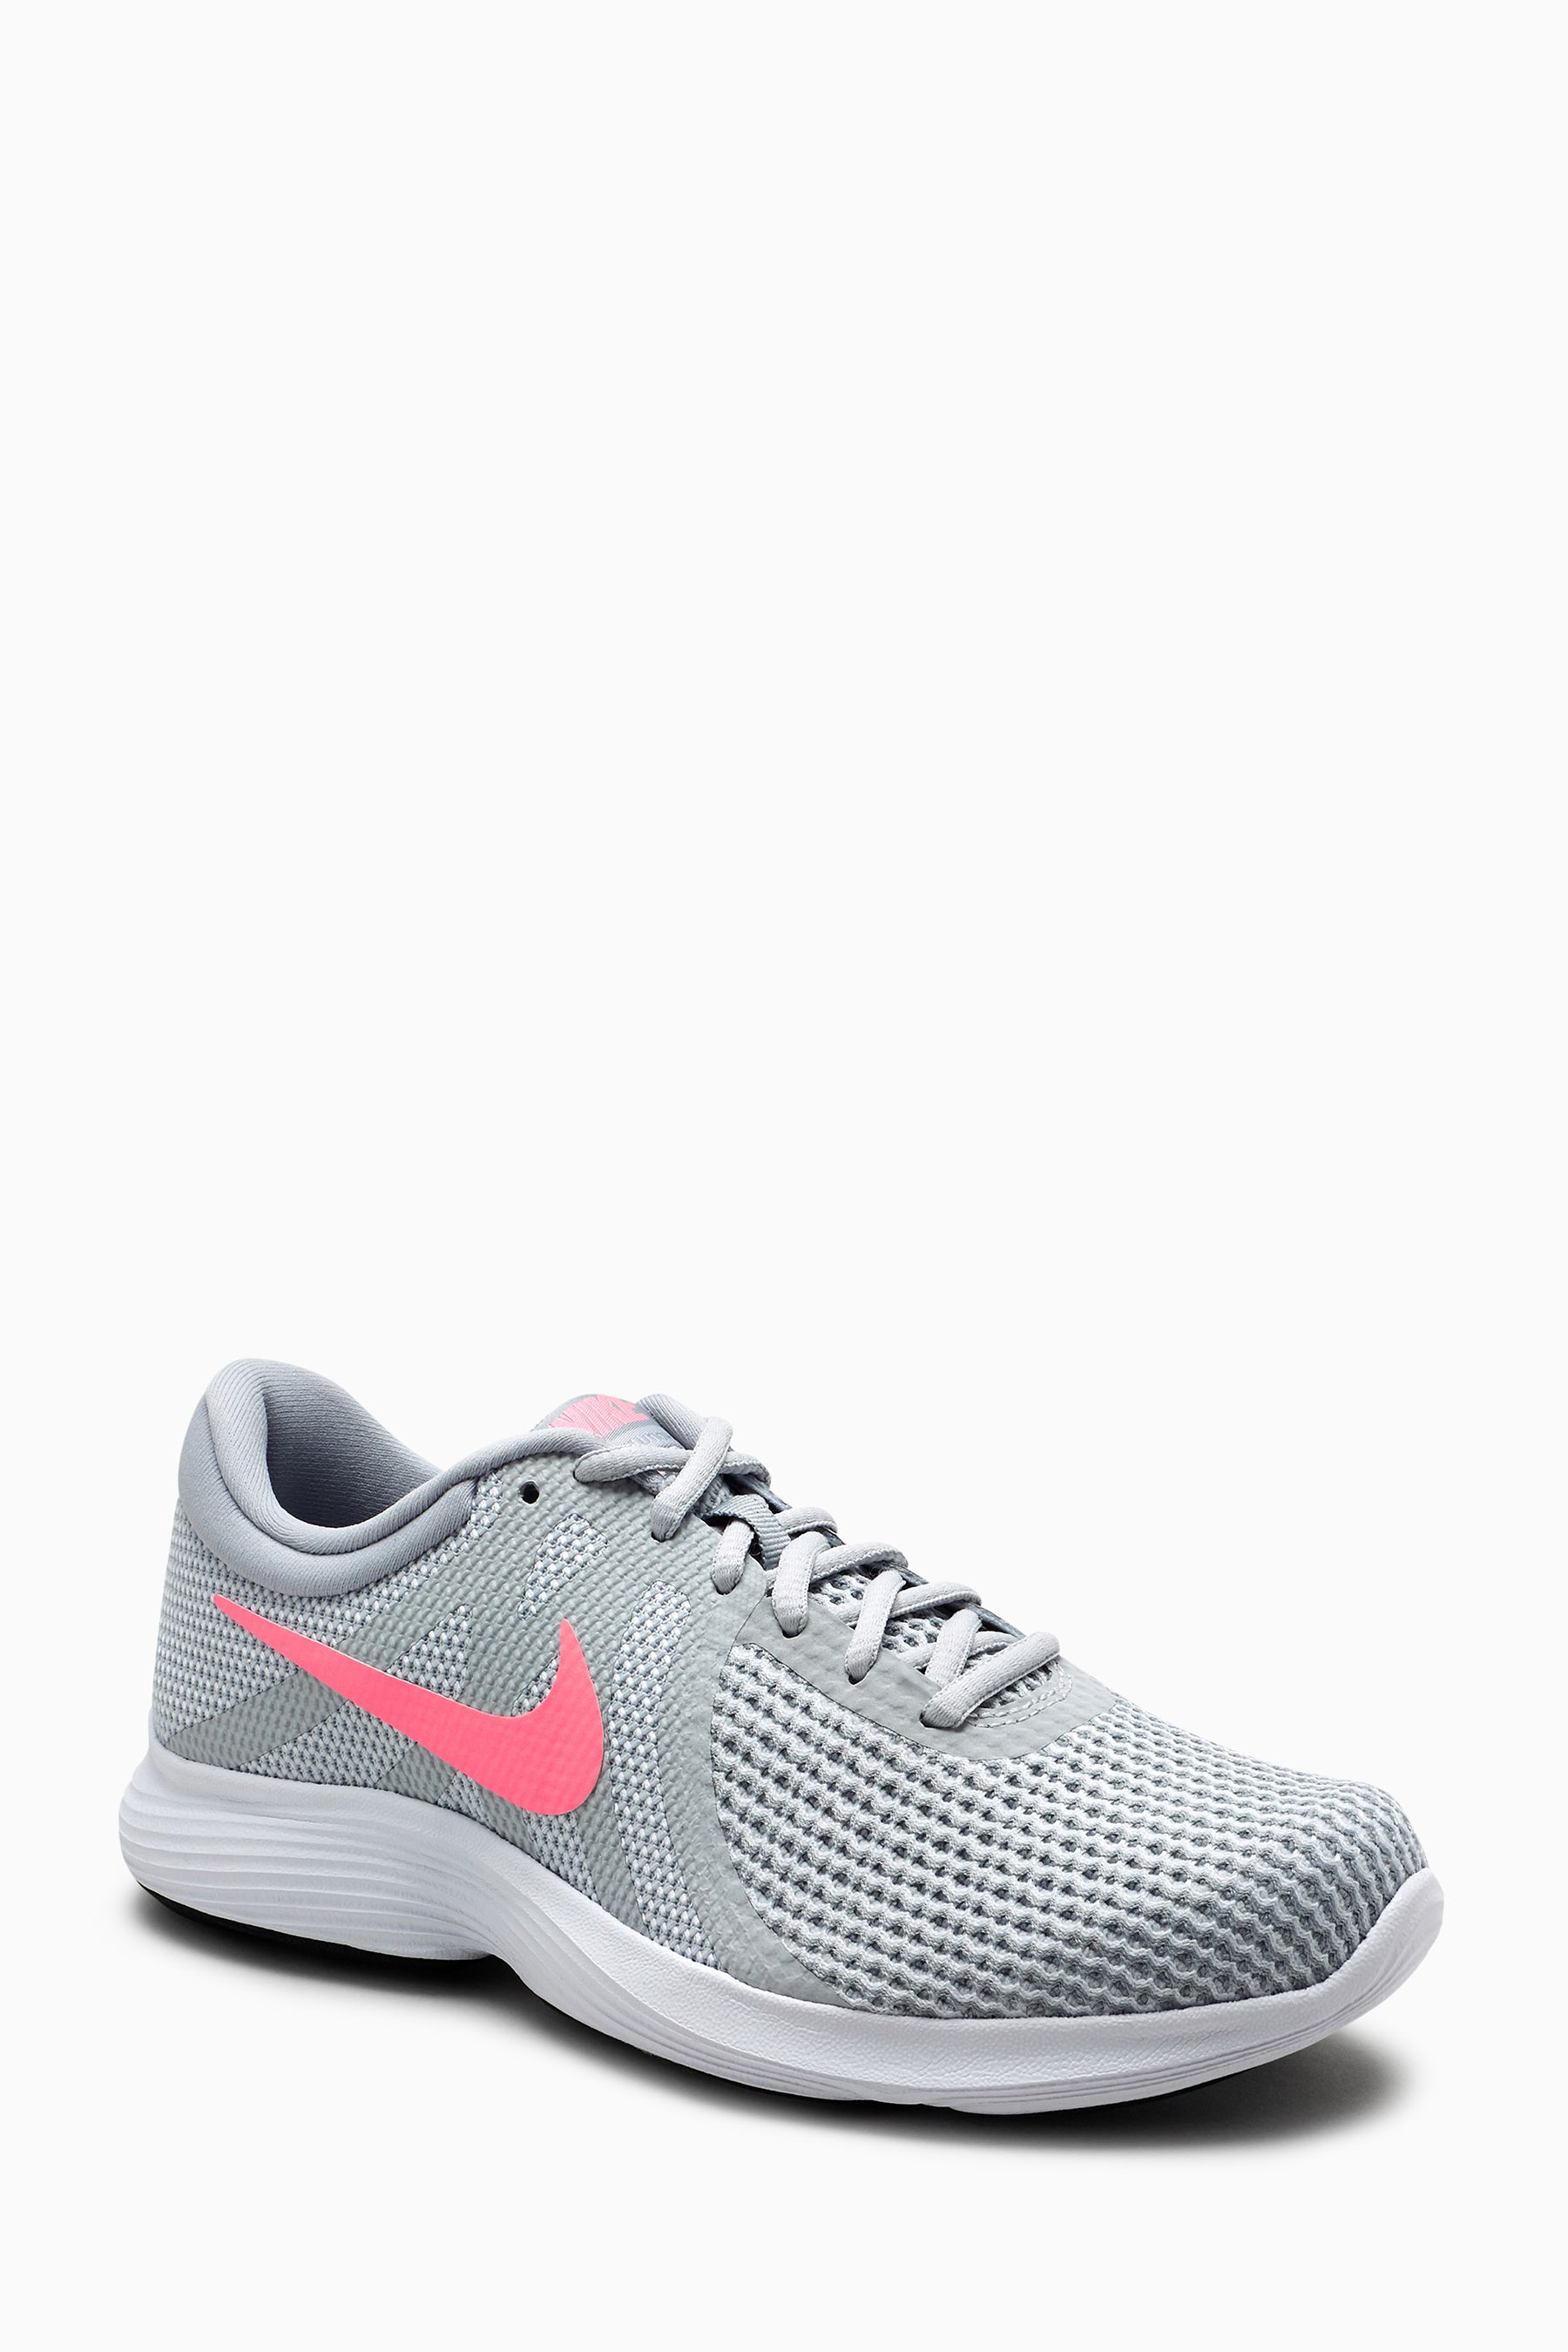 Nike Women's Nike Revolution 4 Running Shoe